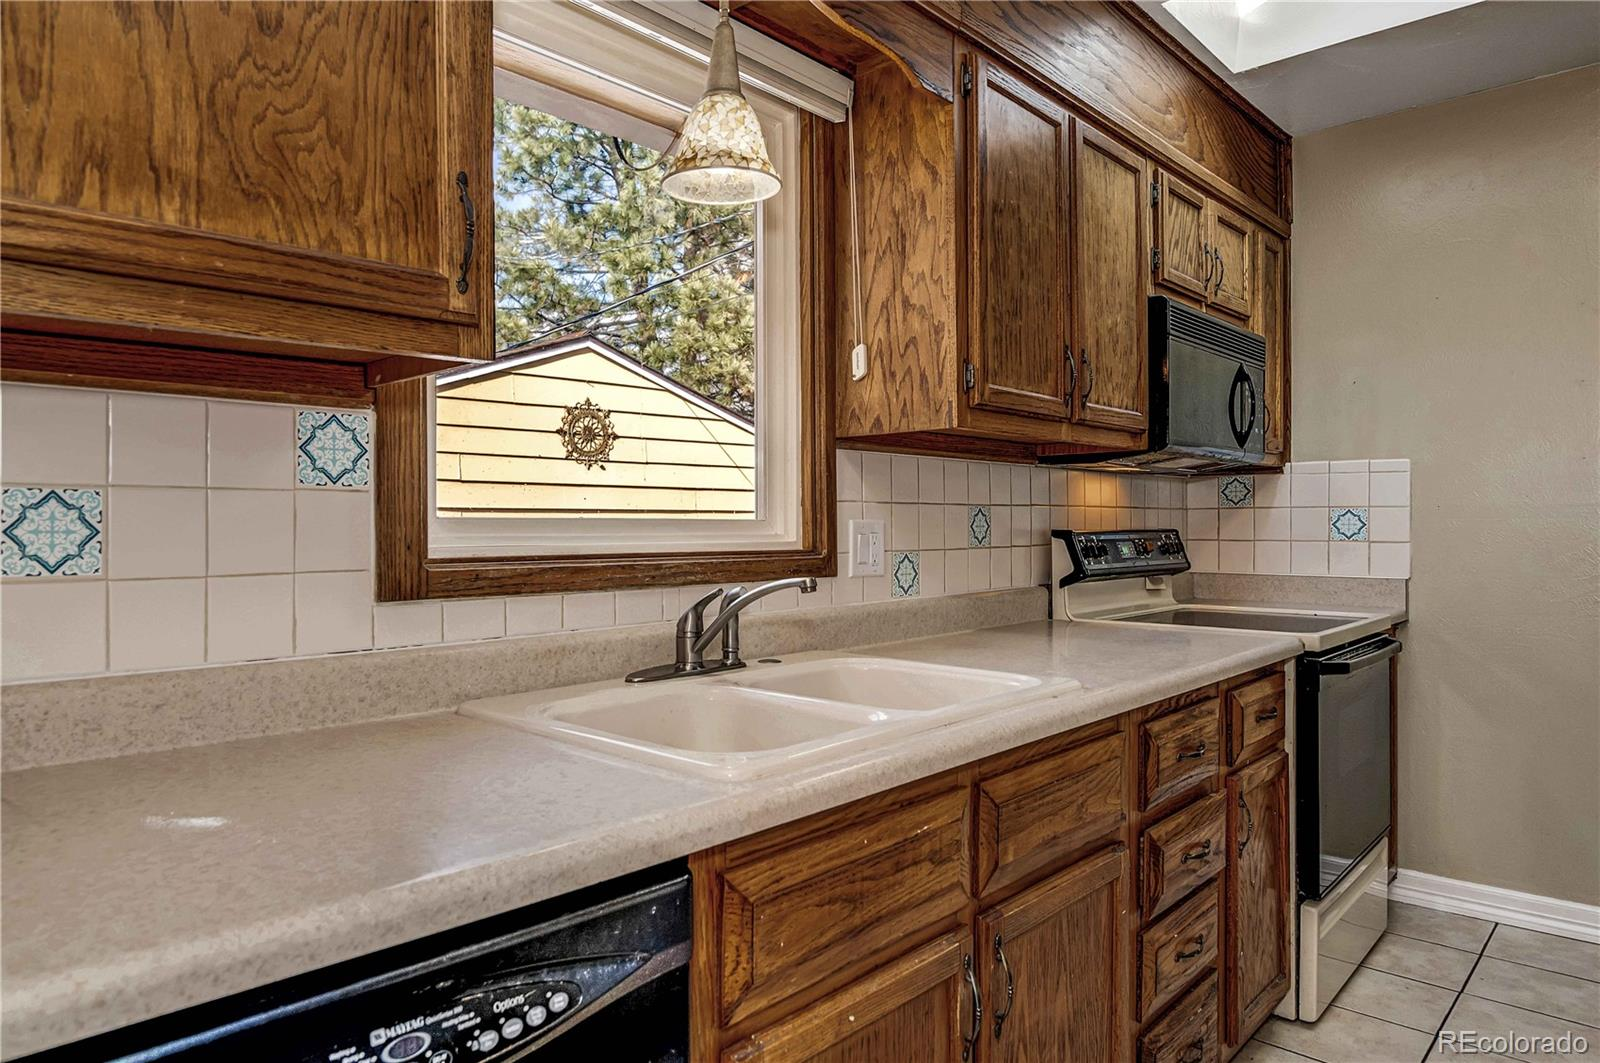 MLS# 5043109 - 12 - 1832 Northview Drive, Colorado Springs, CO 80909